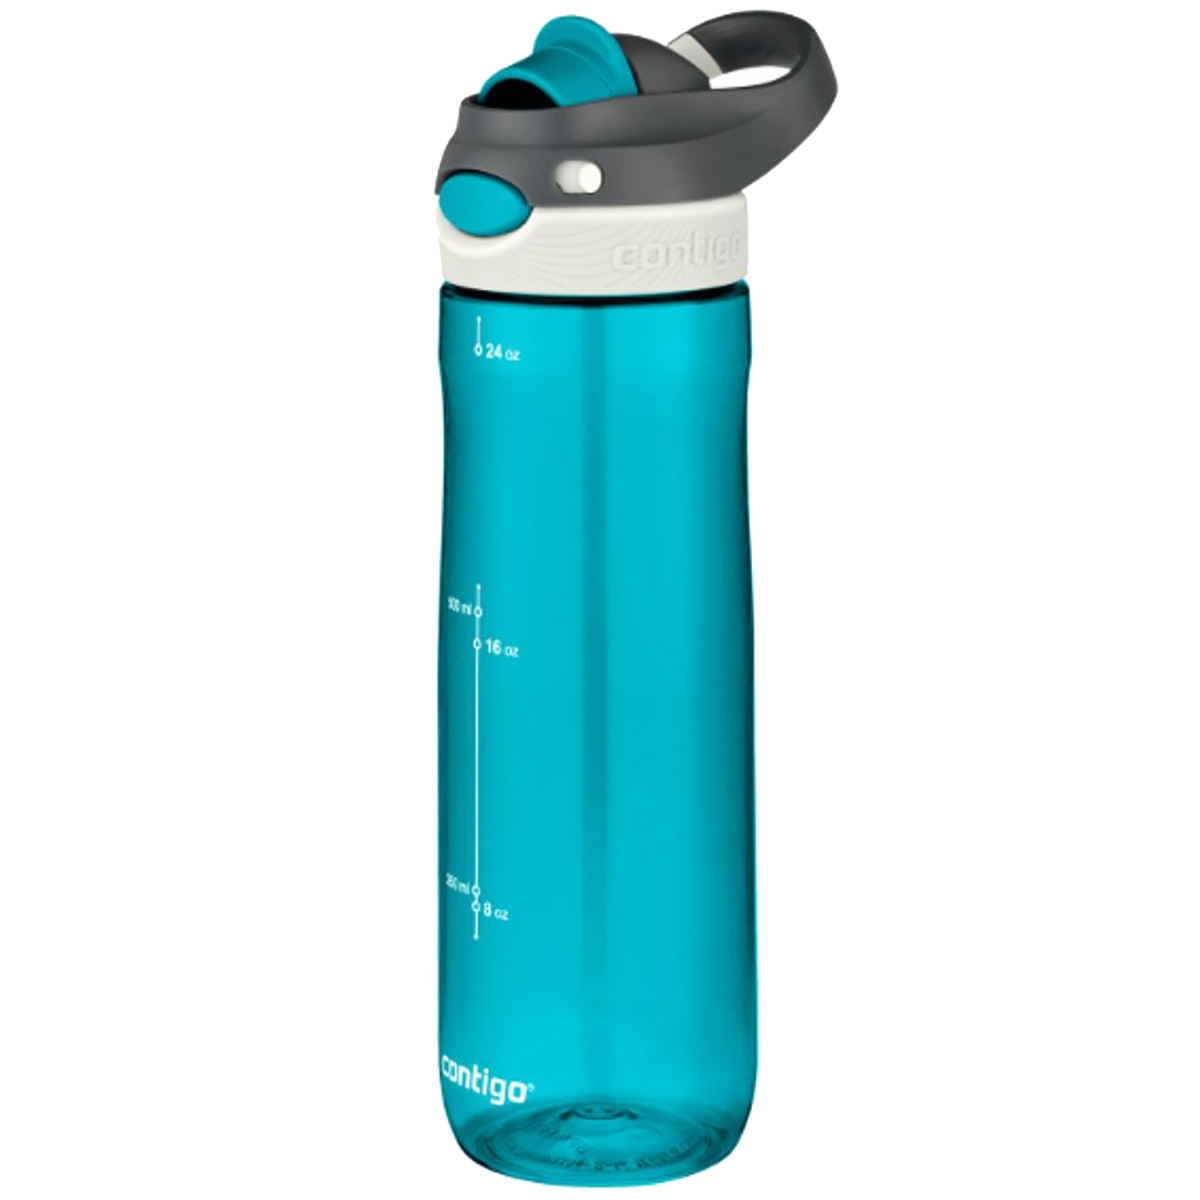 Contigo-24-oz-Chug-Autospout-Leak-Proof-Water-Bottle miniatuur 16